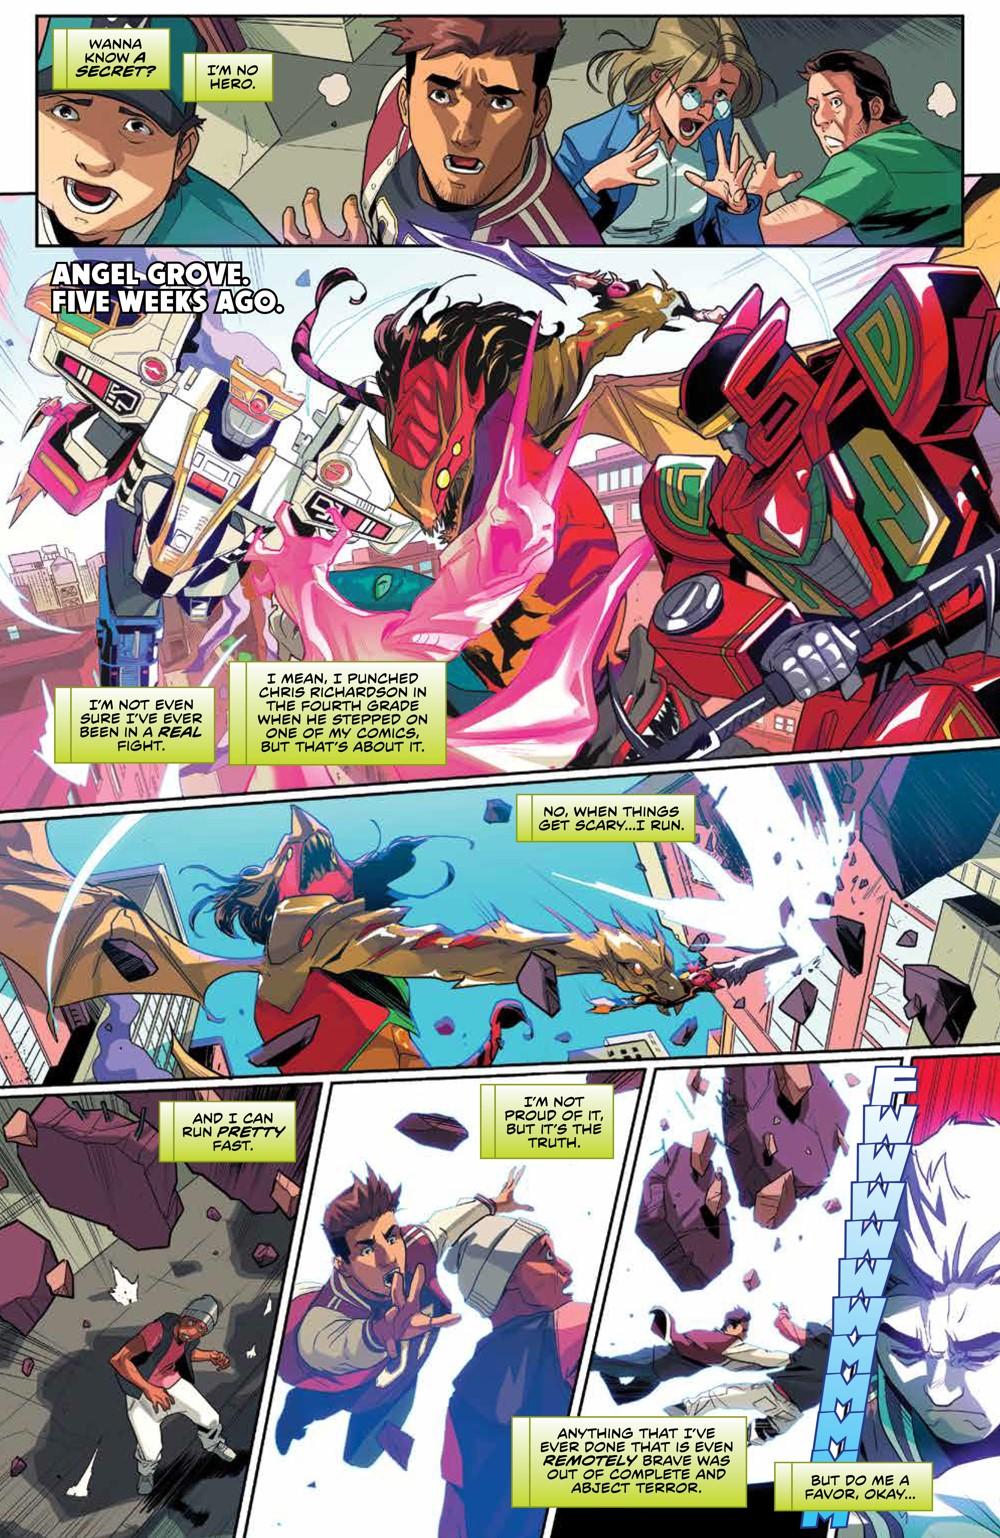 MightyMorphin_v2_SC_PRESS_7 ComicList Previews: MIGHTY MORPHIN VOLUME 2 TP